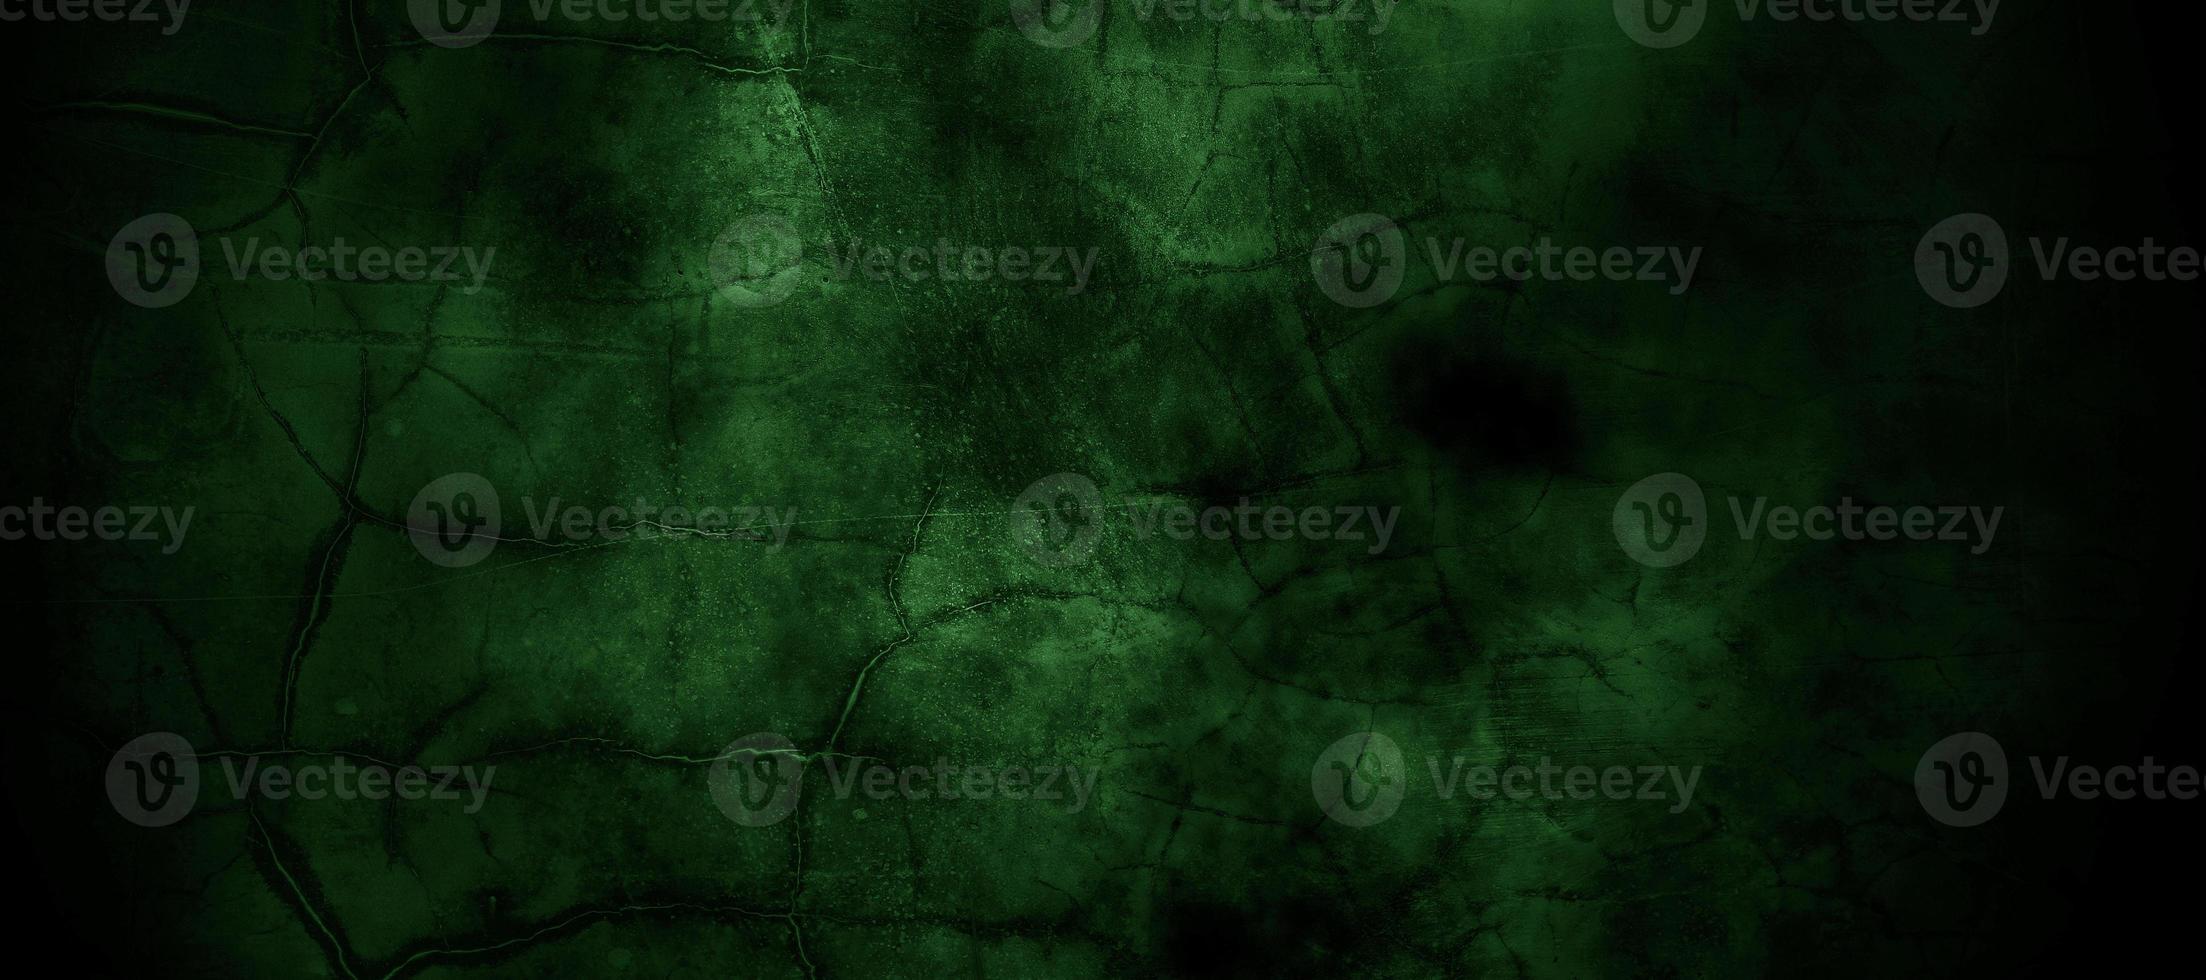 enge donkergroene mistige gebarsten muur voor achtergrond foto